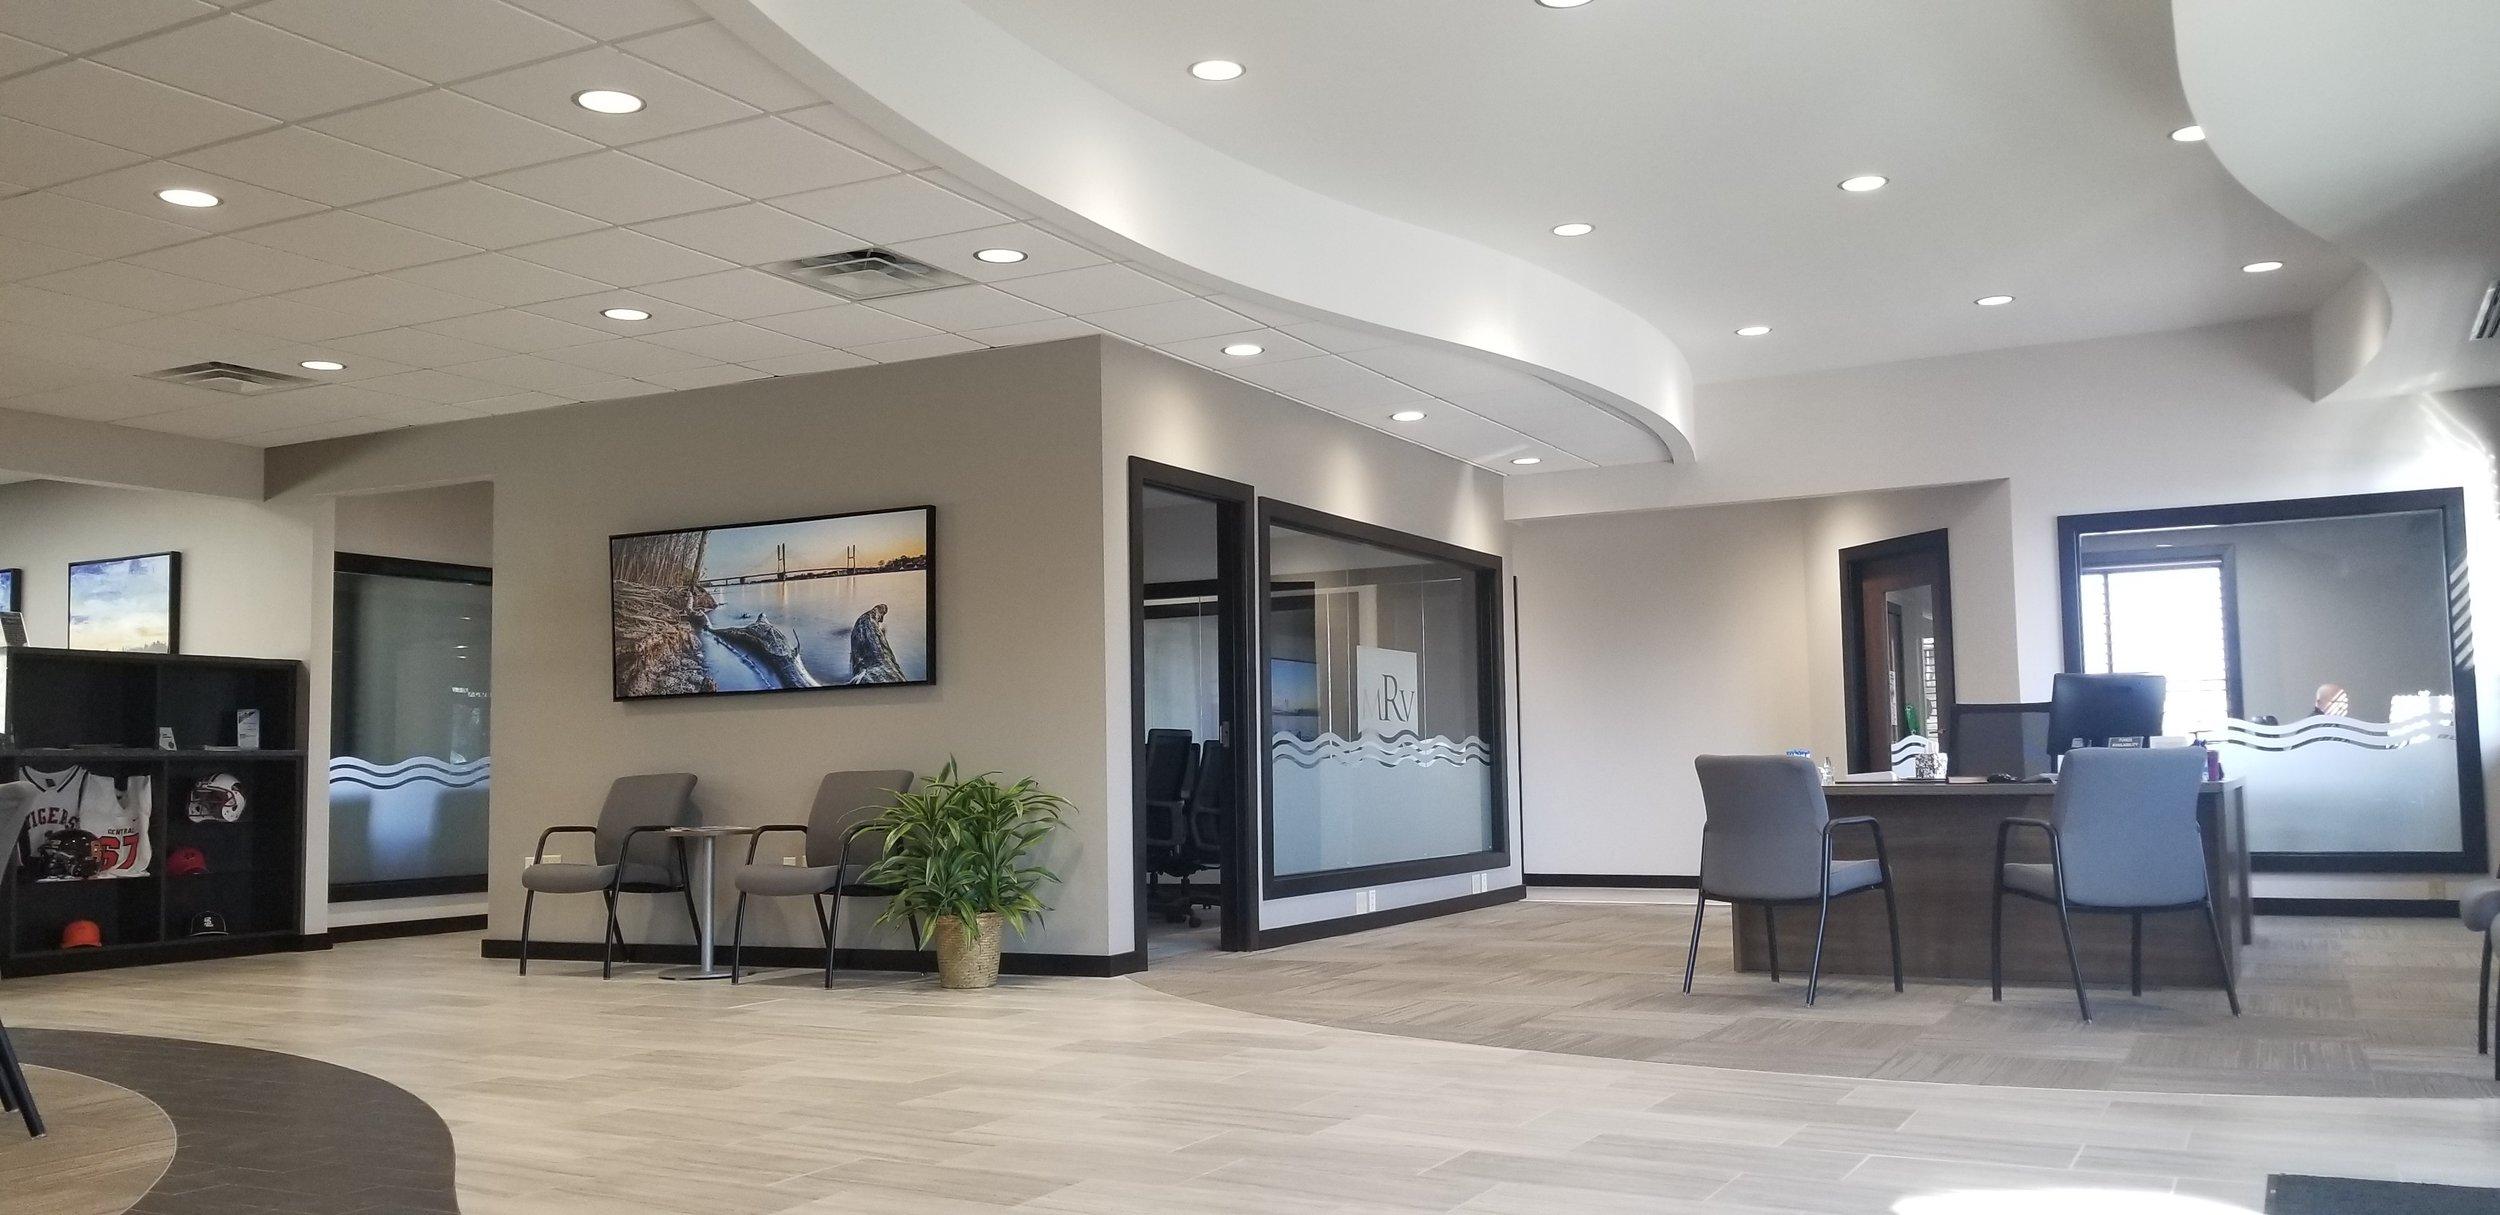 MRV Bank - Cape Girardeau, Missouri